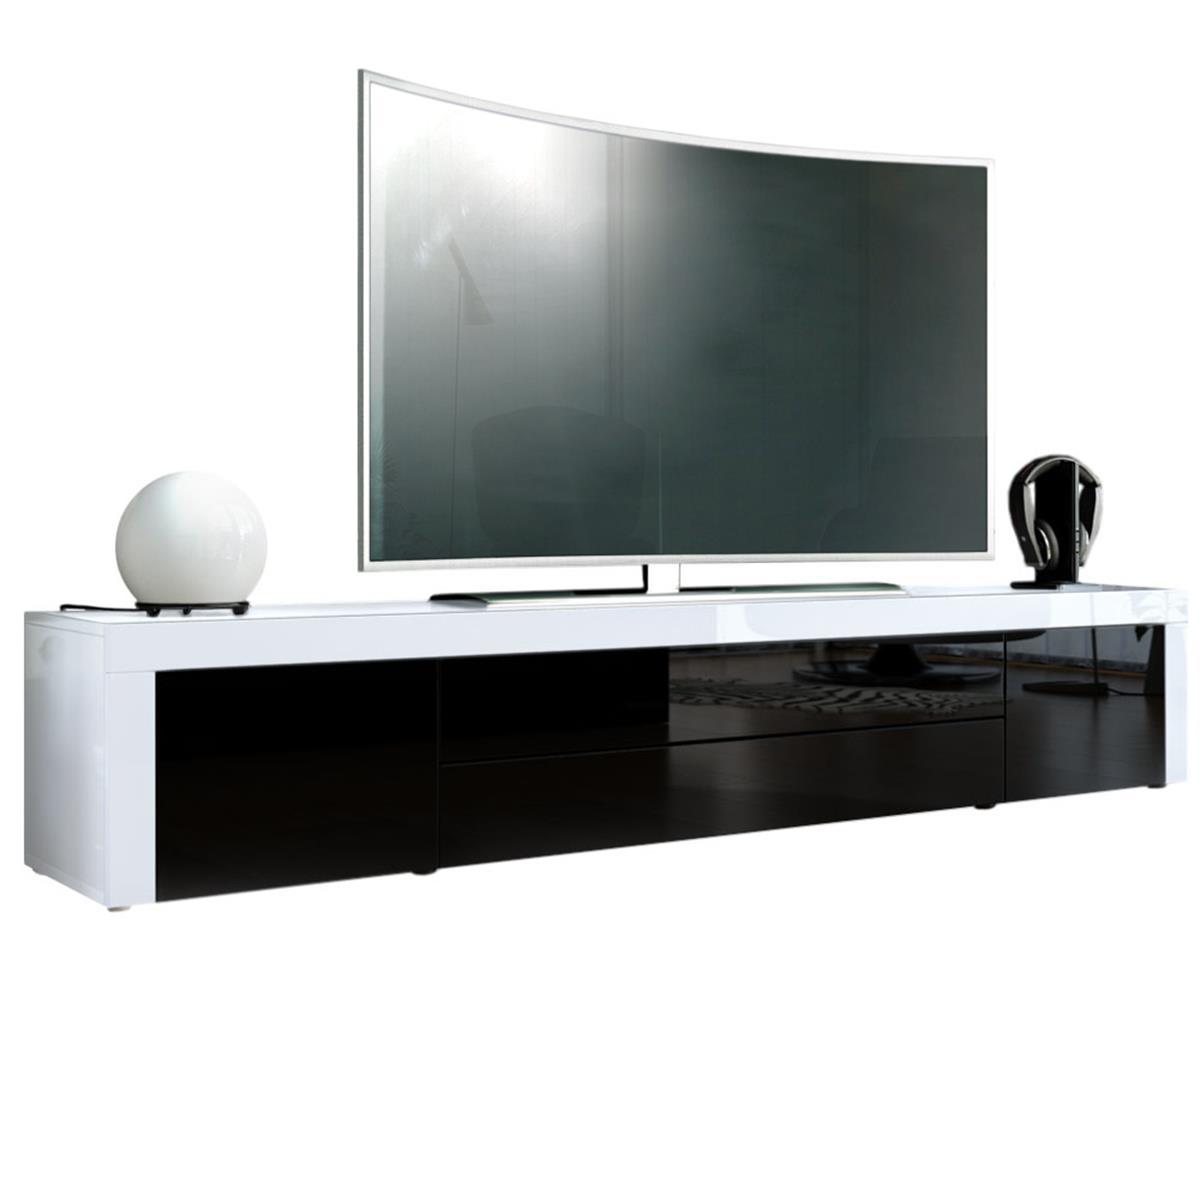 Tv Sideboard Wei Interesting Beautiful With Tv Sideboard